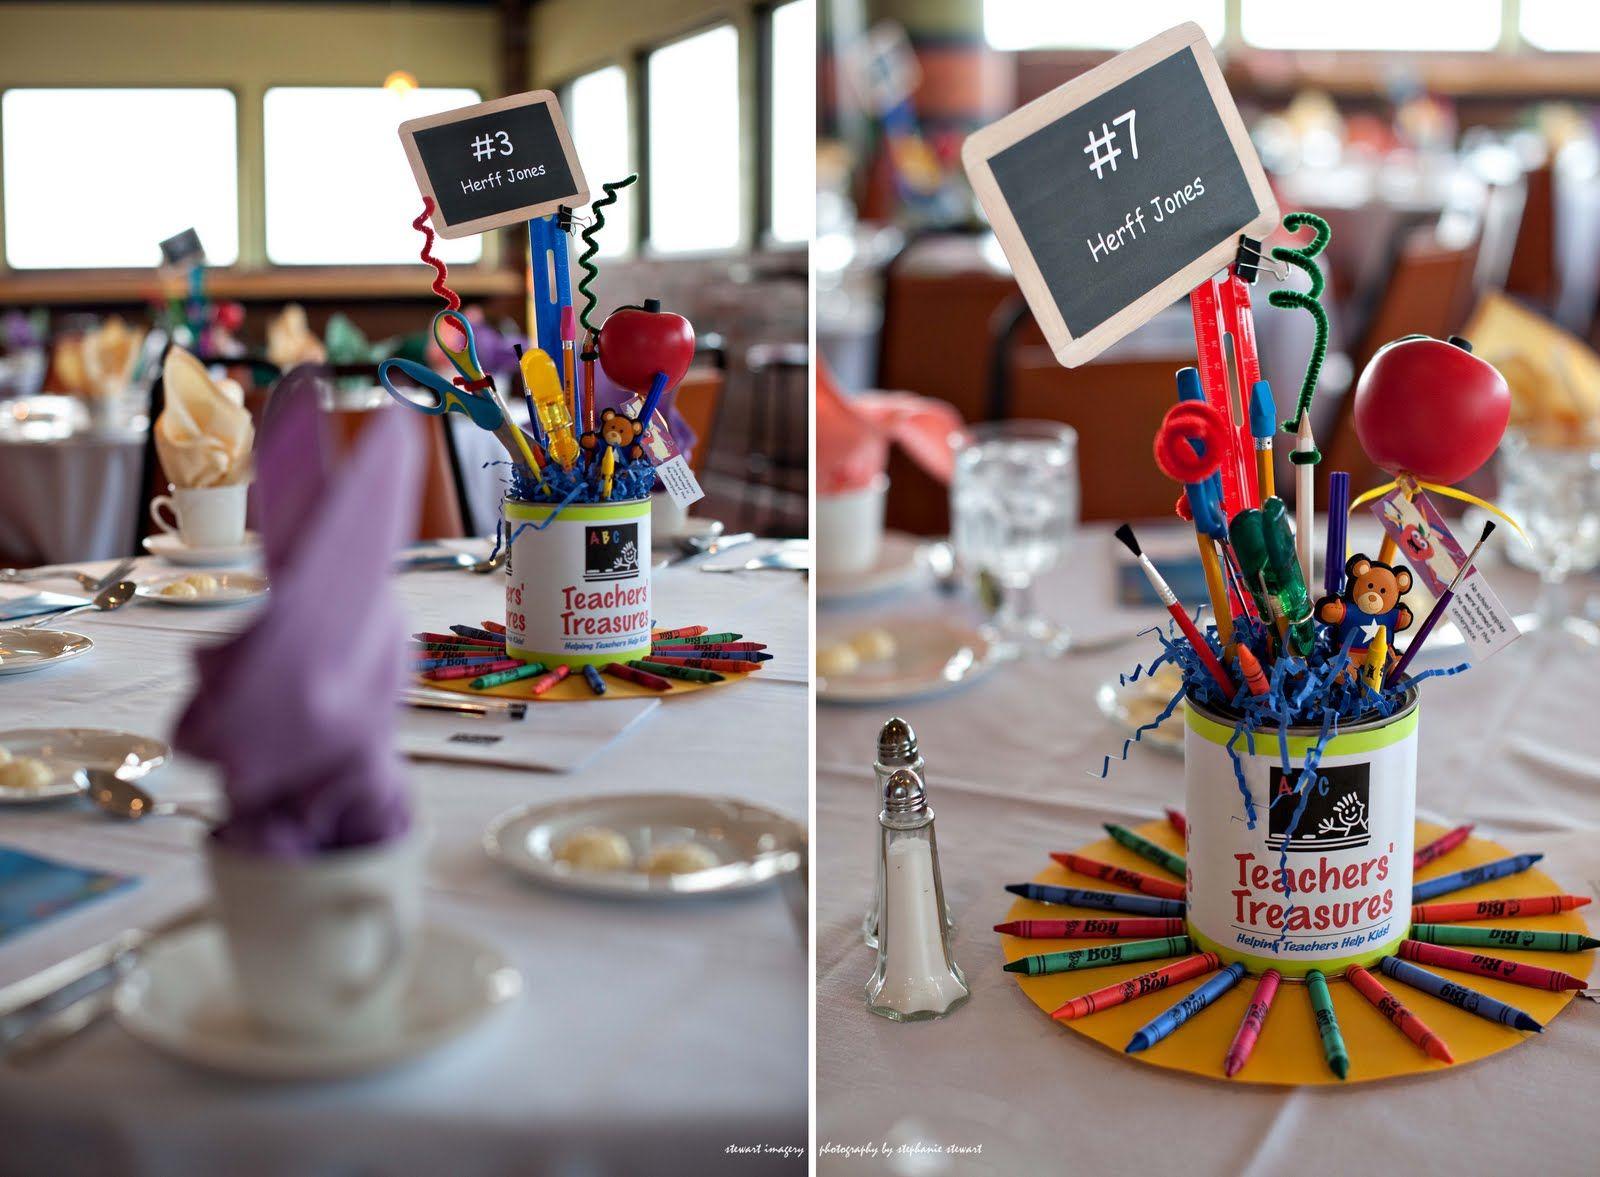 Educational luncheon centerpiece event teachers